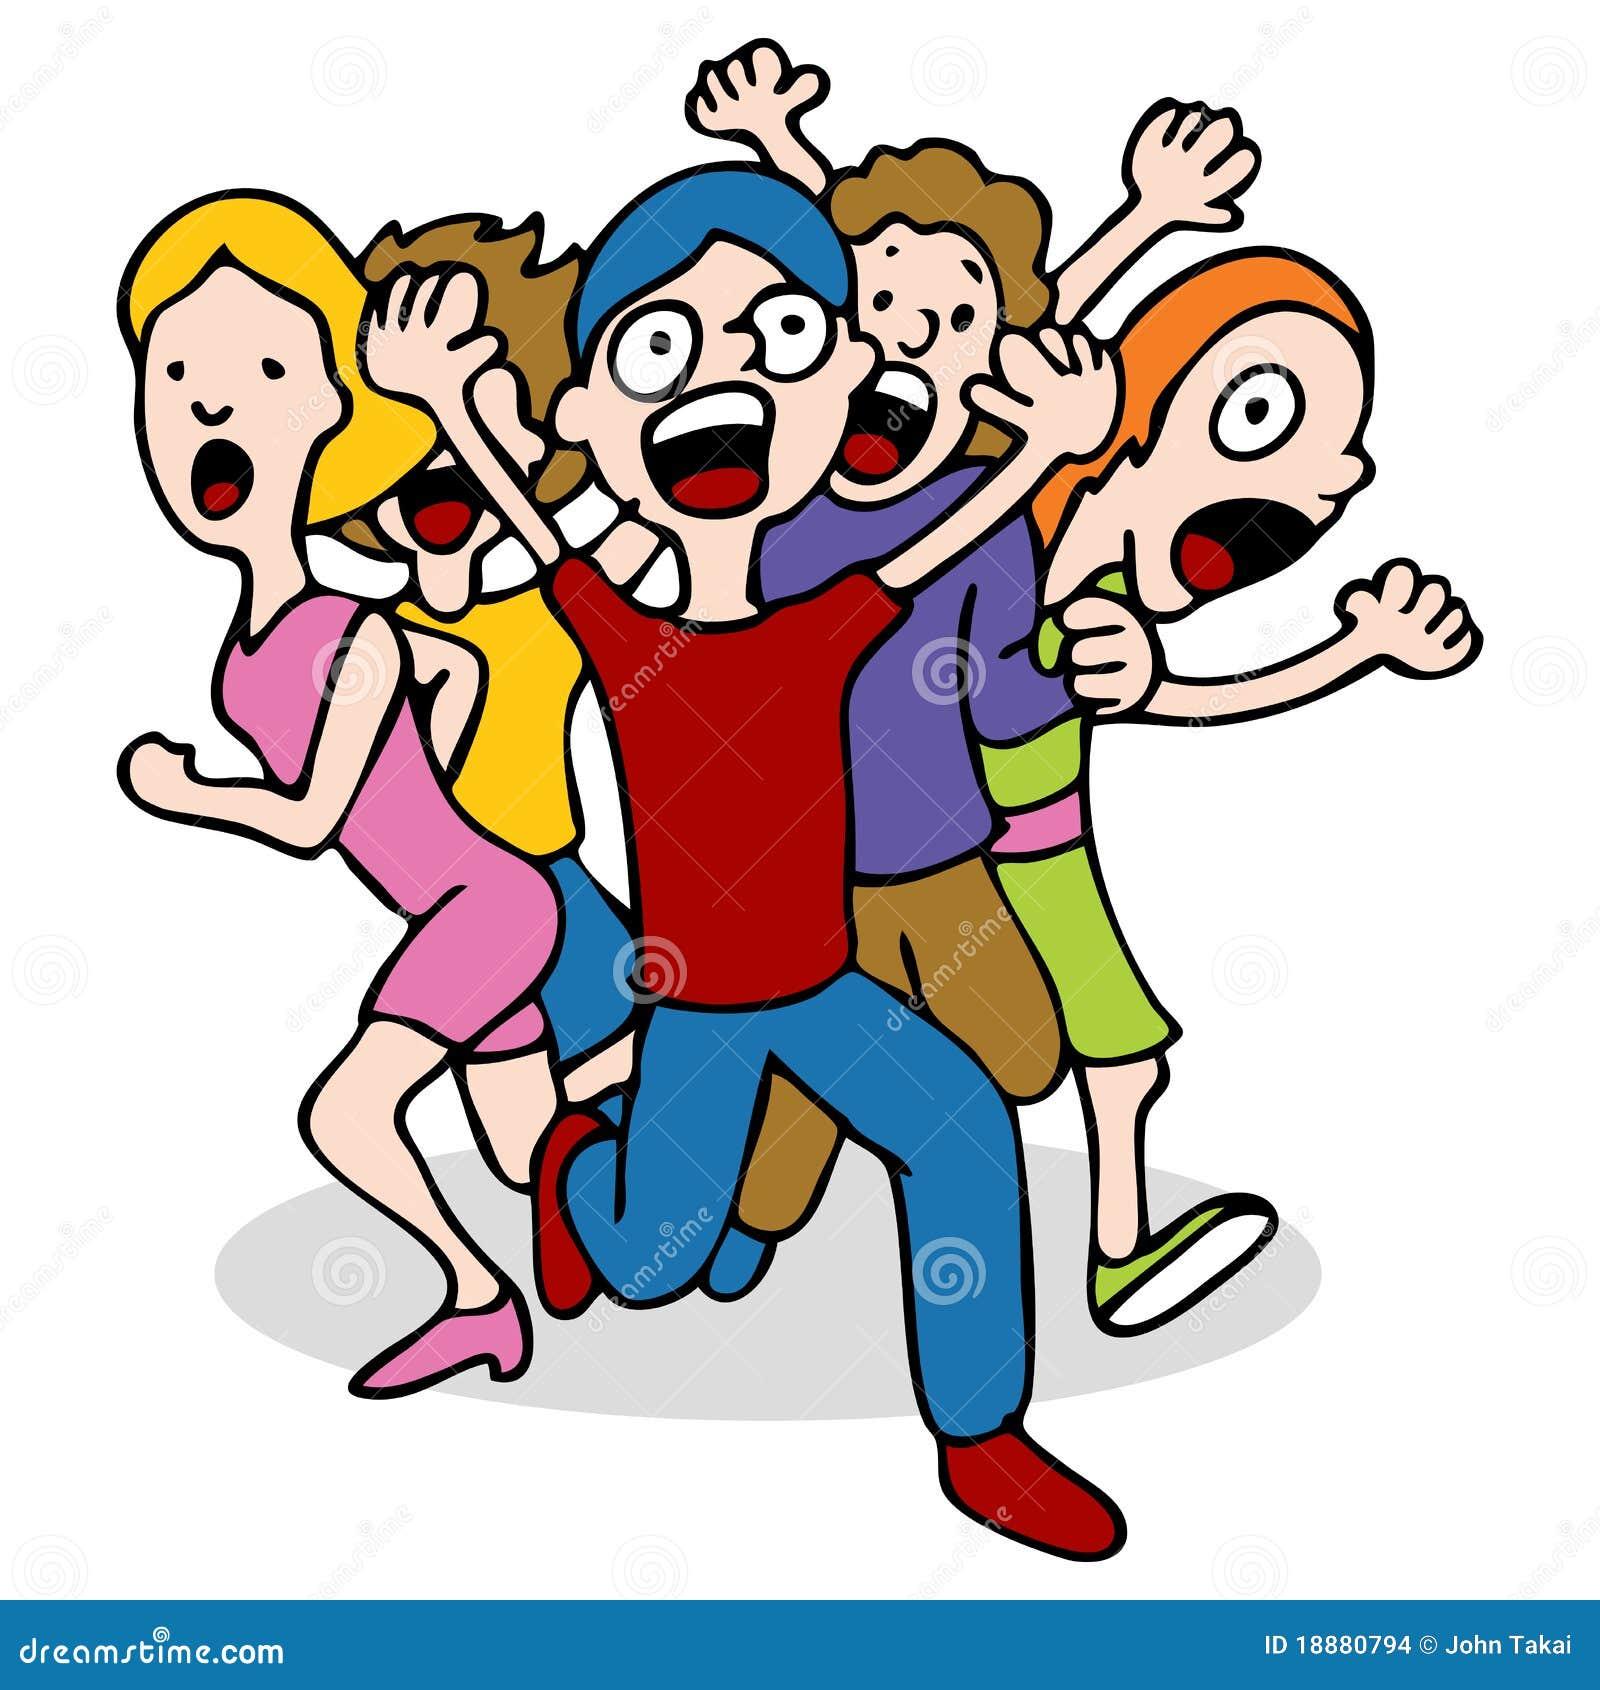 People Panicking Stock Images - Image: 18880794